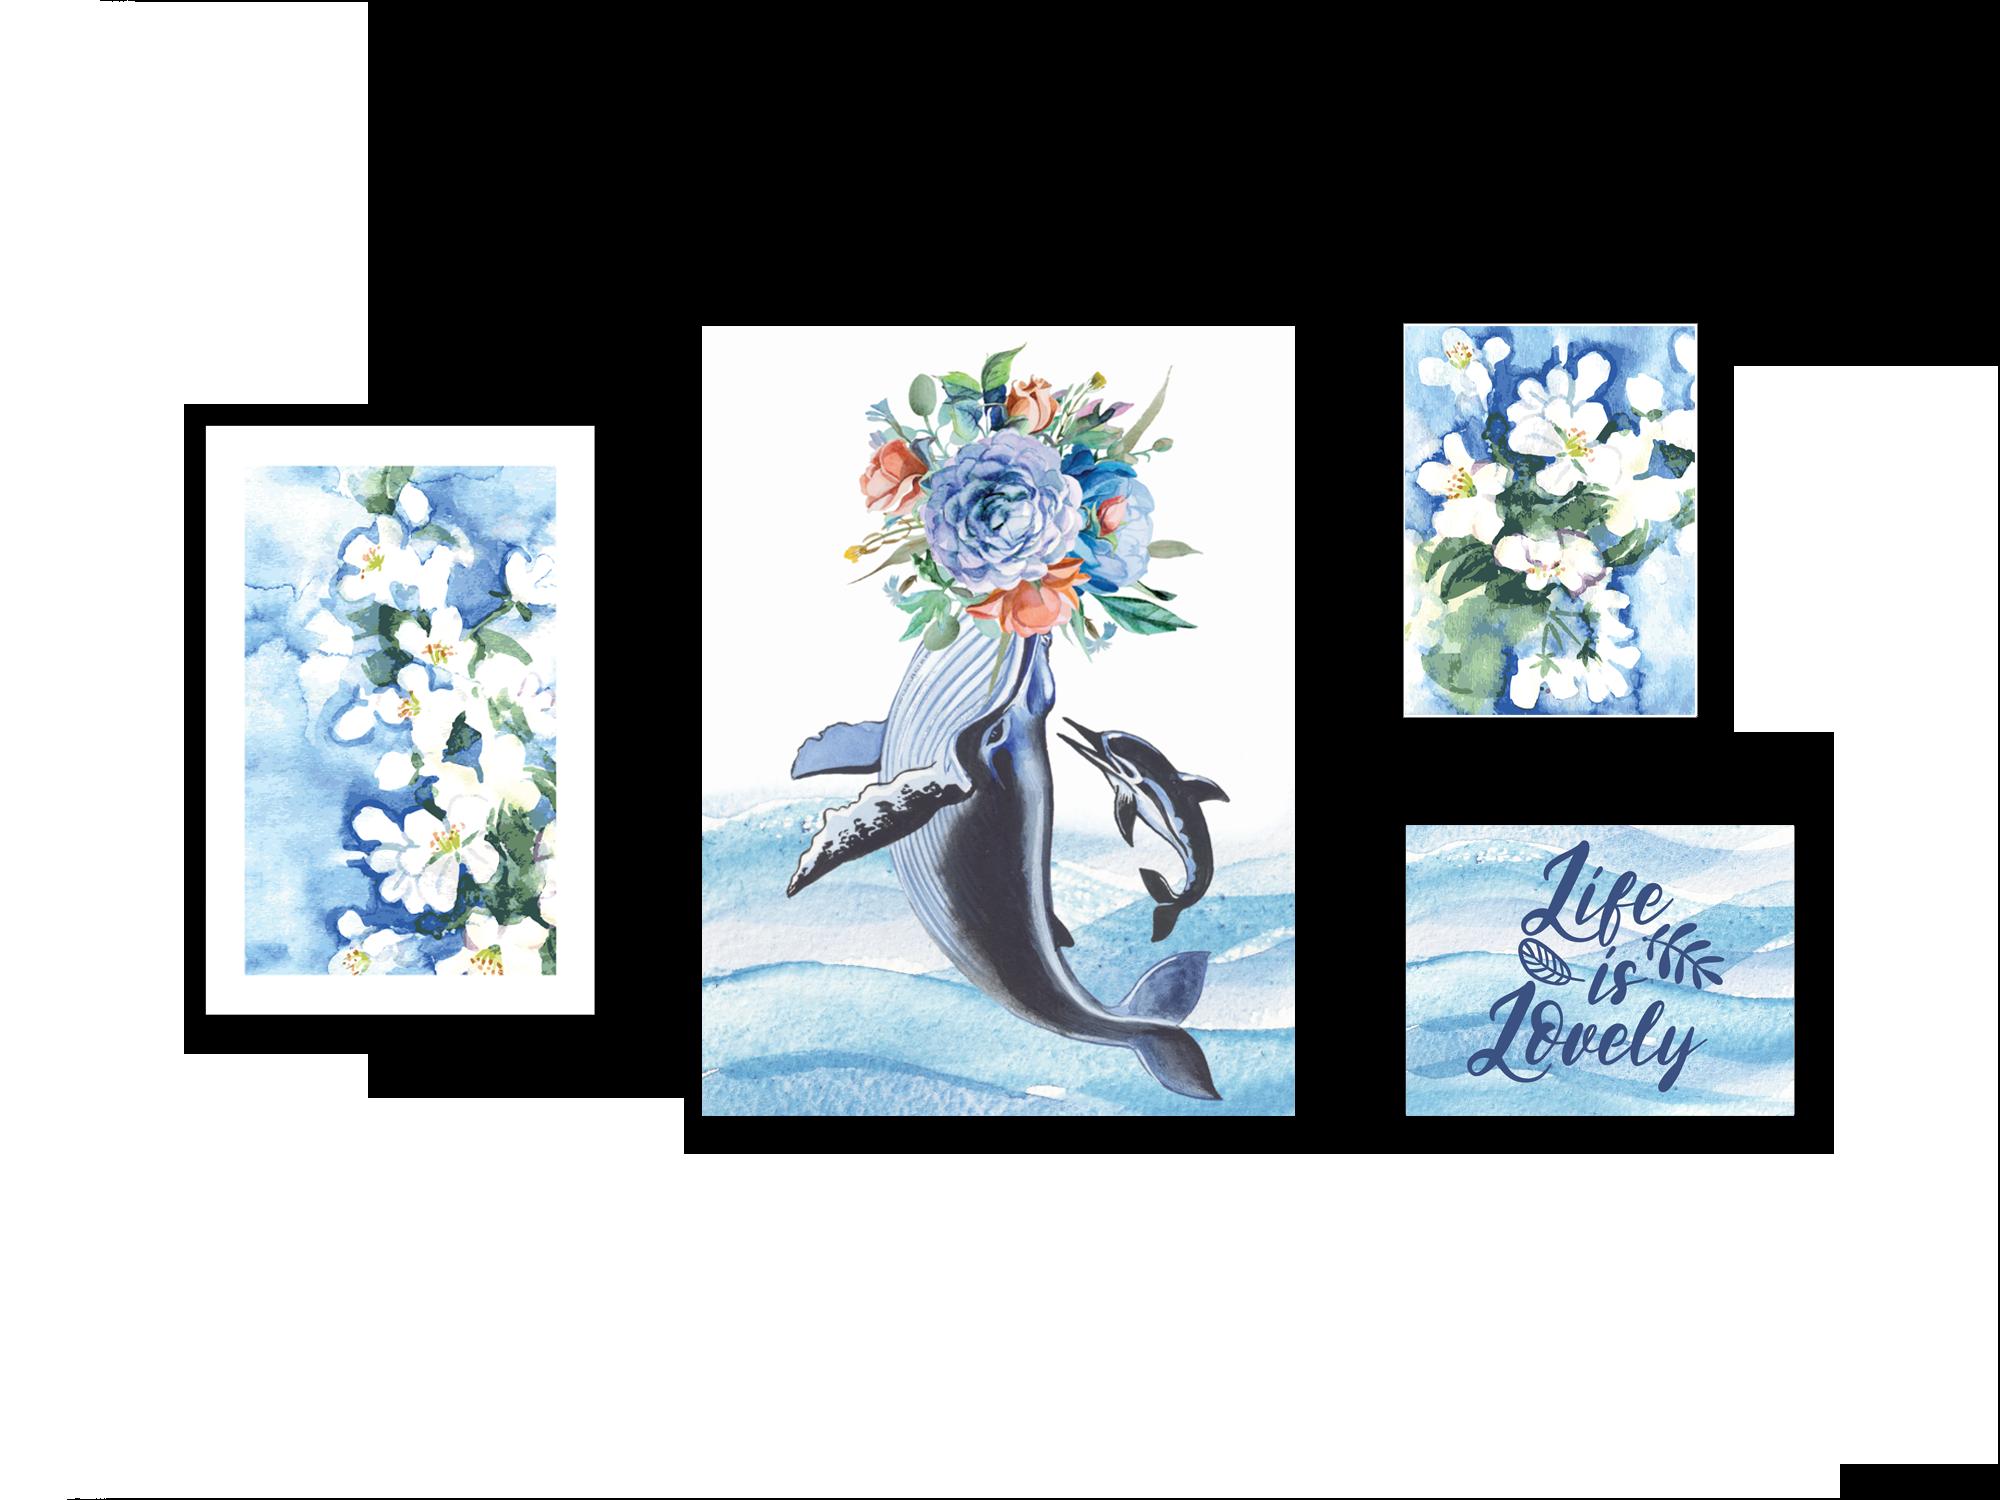 Tranh gắn hoa lụa BLue dolphin